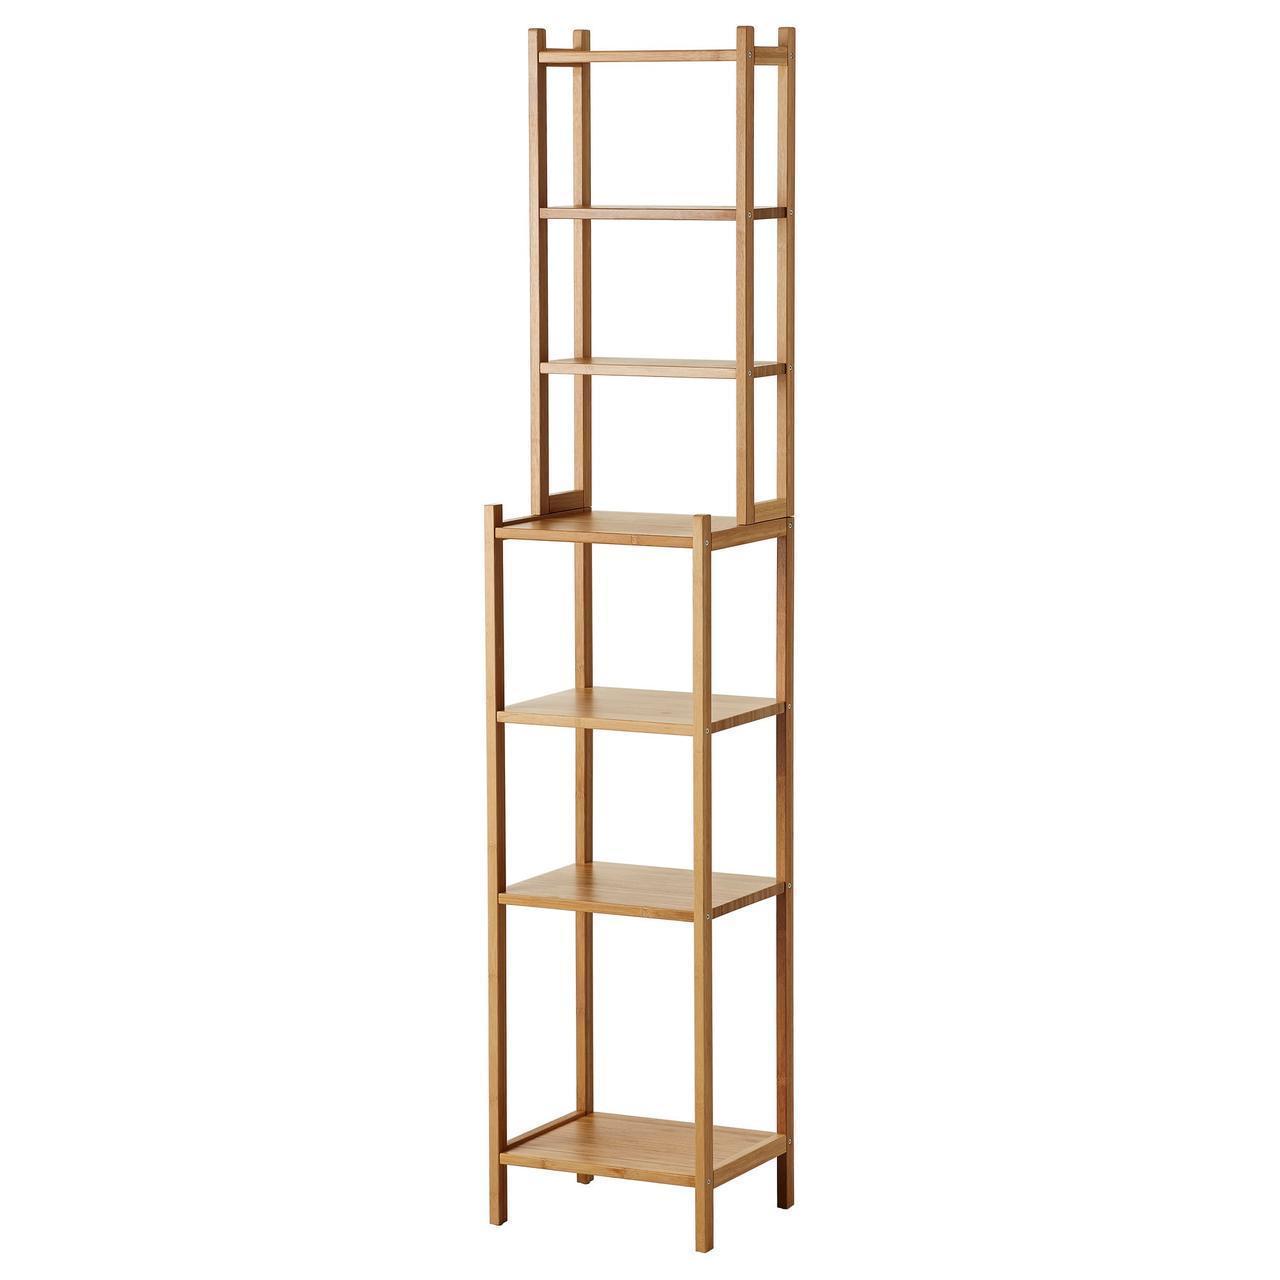 IKEA RAGRUND Стеллаж, бамбук  (302.530.67)